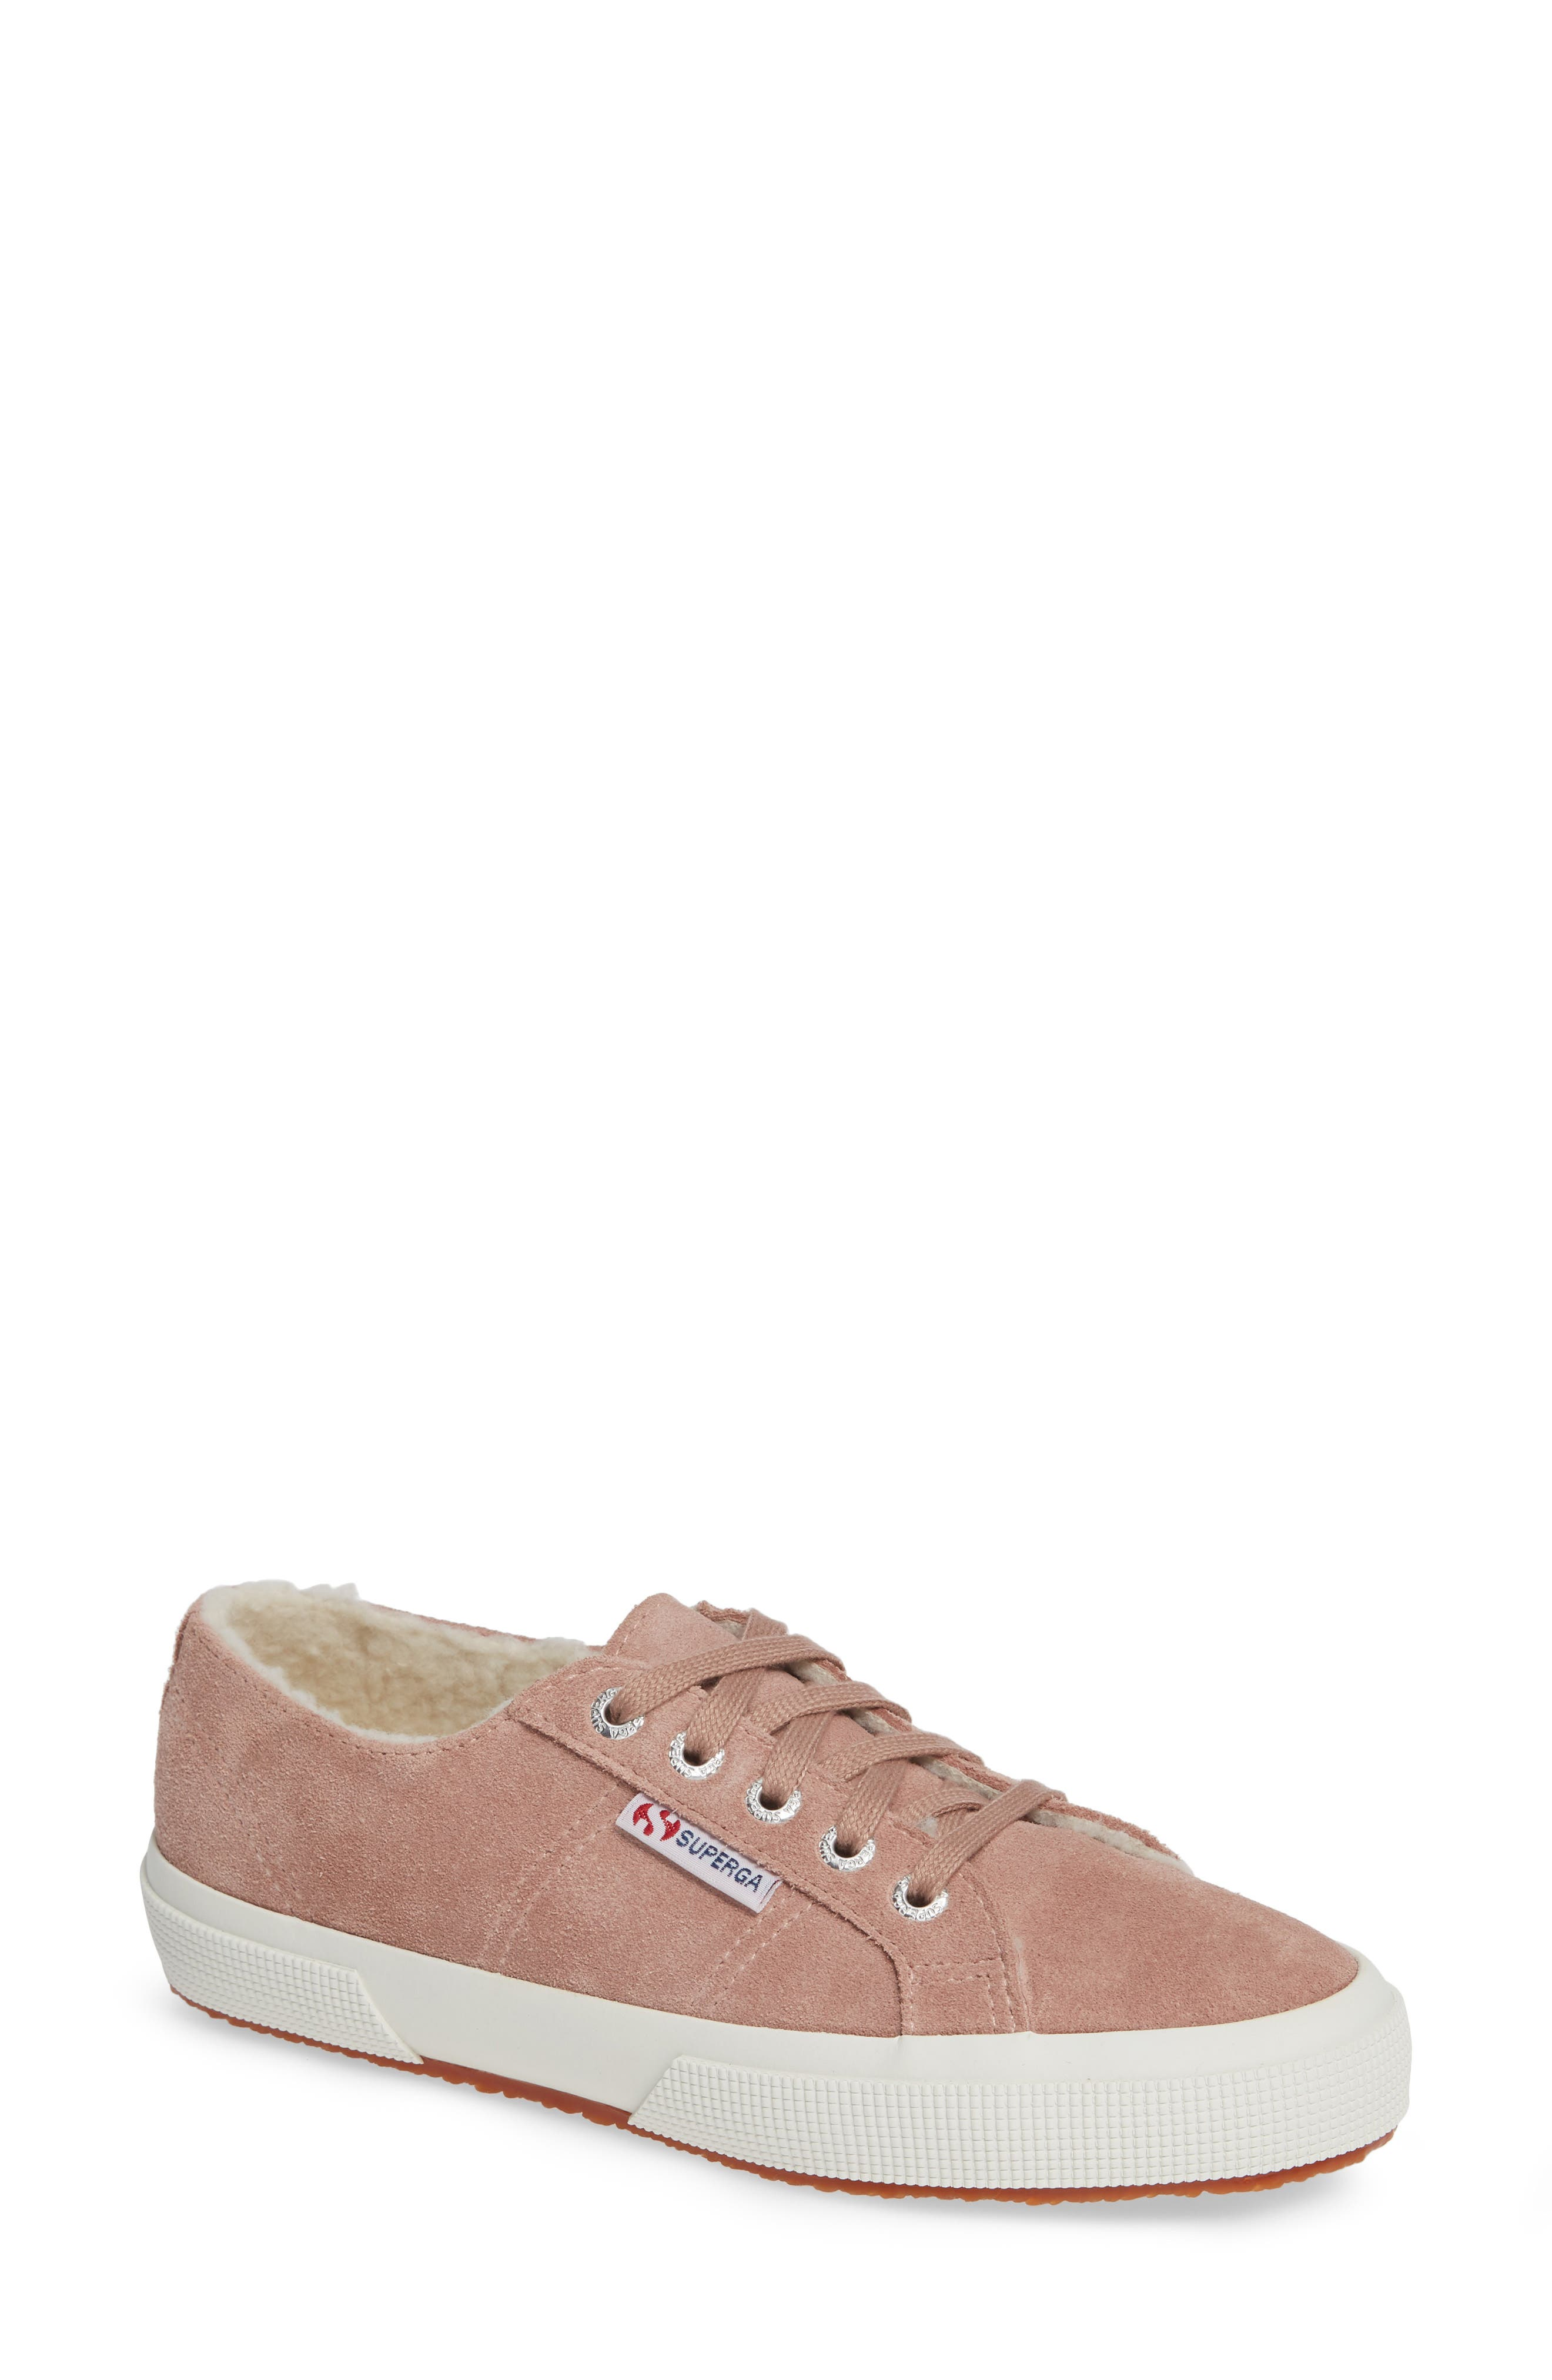 2750 Suefurw Sneaker,                         Main,                         color, ROSE SUEDE